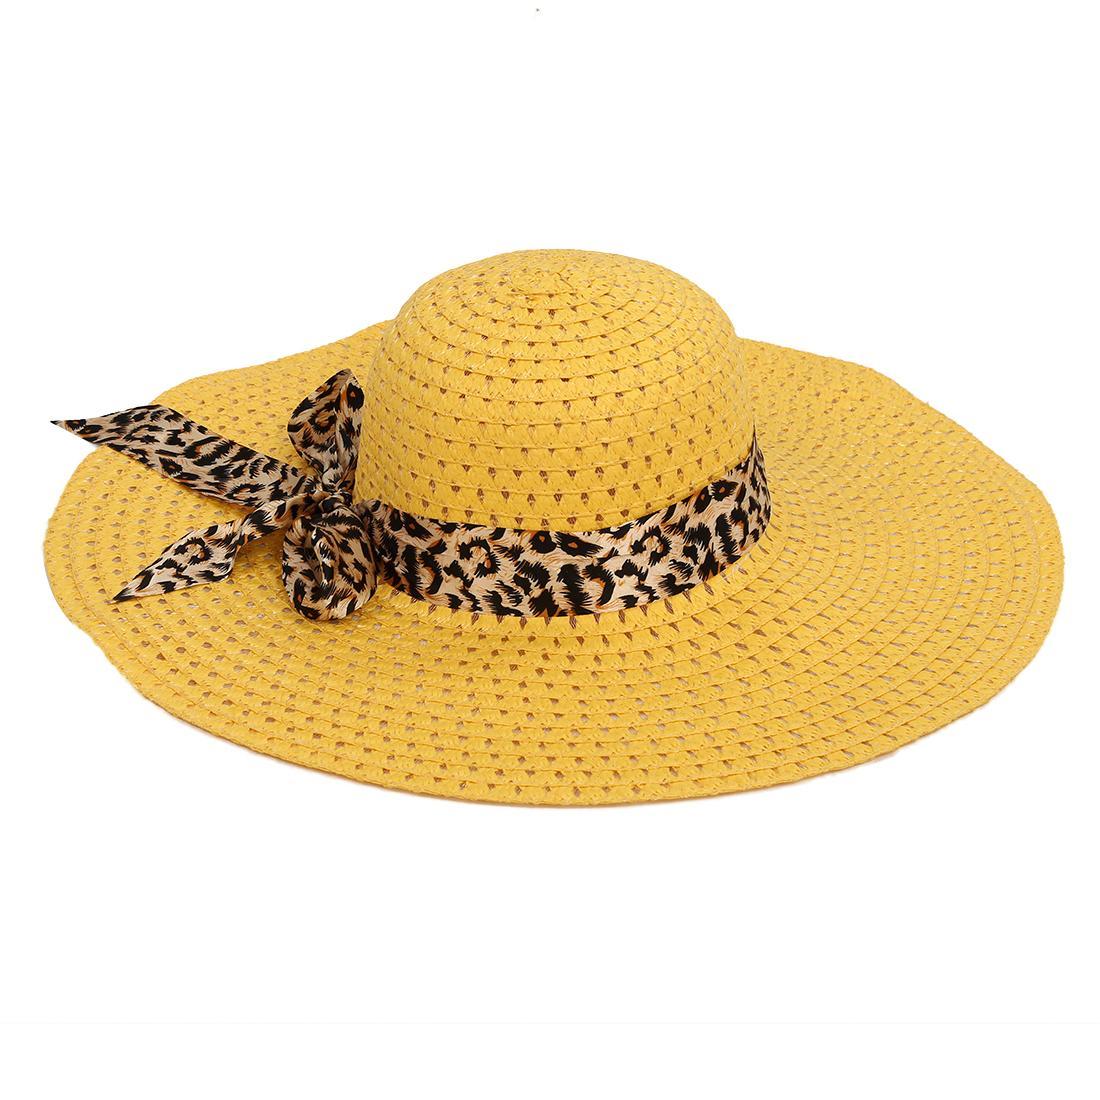 4d2b5dc29baaa Beige Summer Exquisite Leopard Ribbon Bowknot Decorated Openwork Sun Hat  For Women